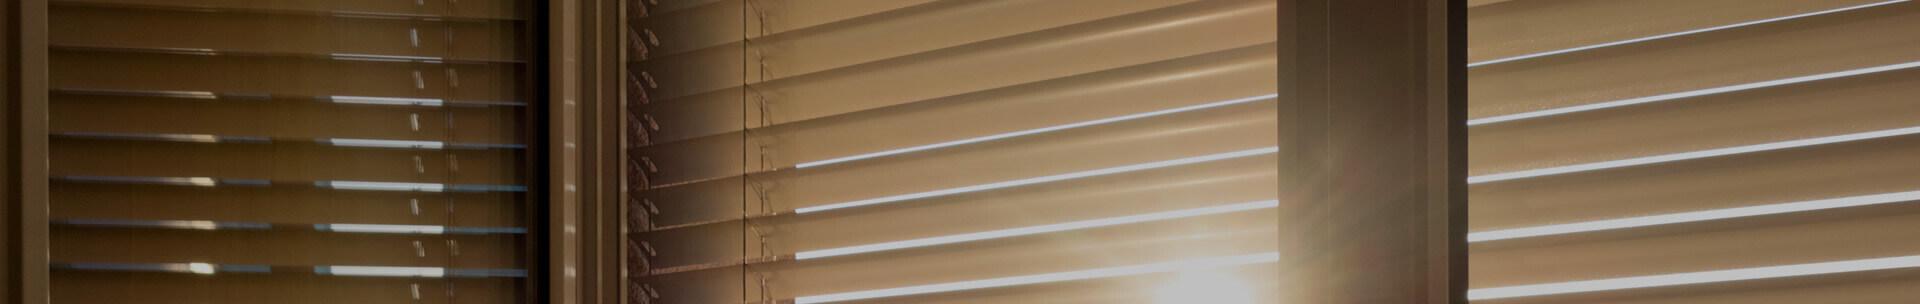 Berühmt Plissee waschen in 4 Schritten | anleitungen.com VZ17